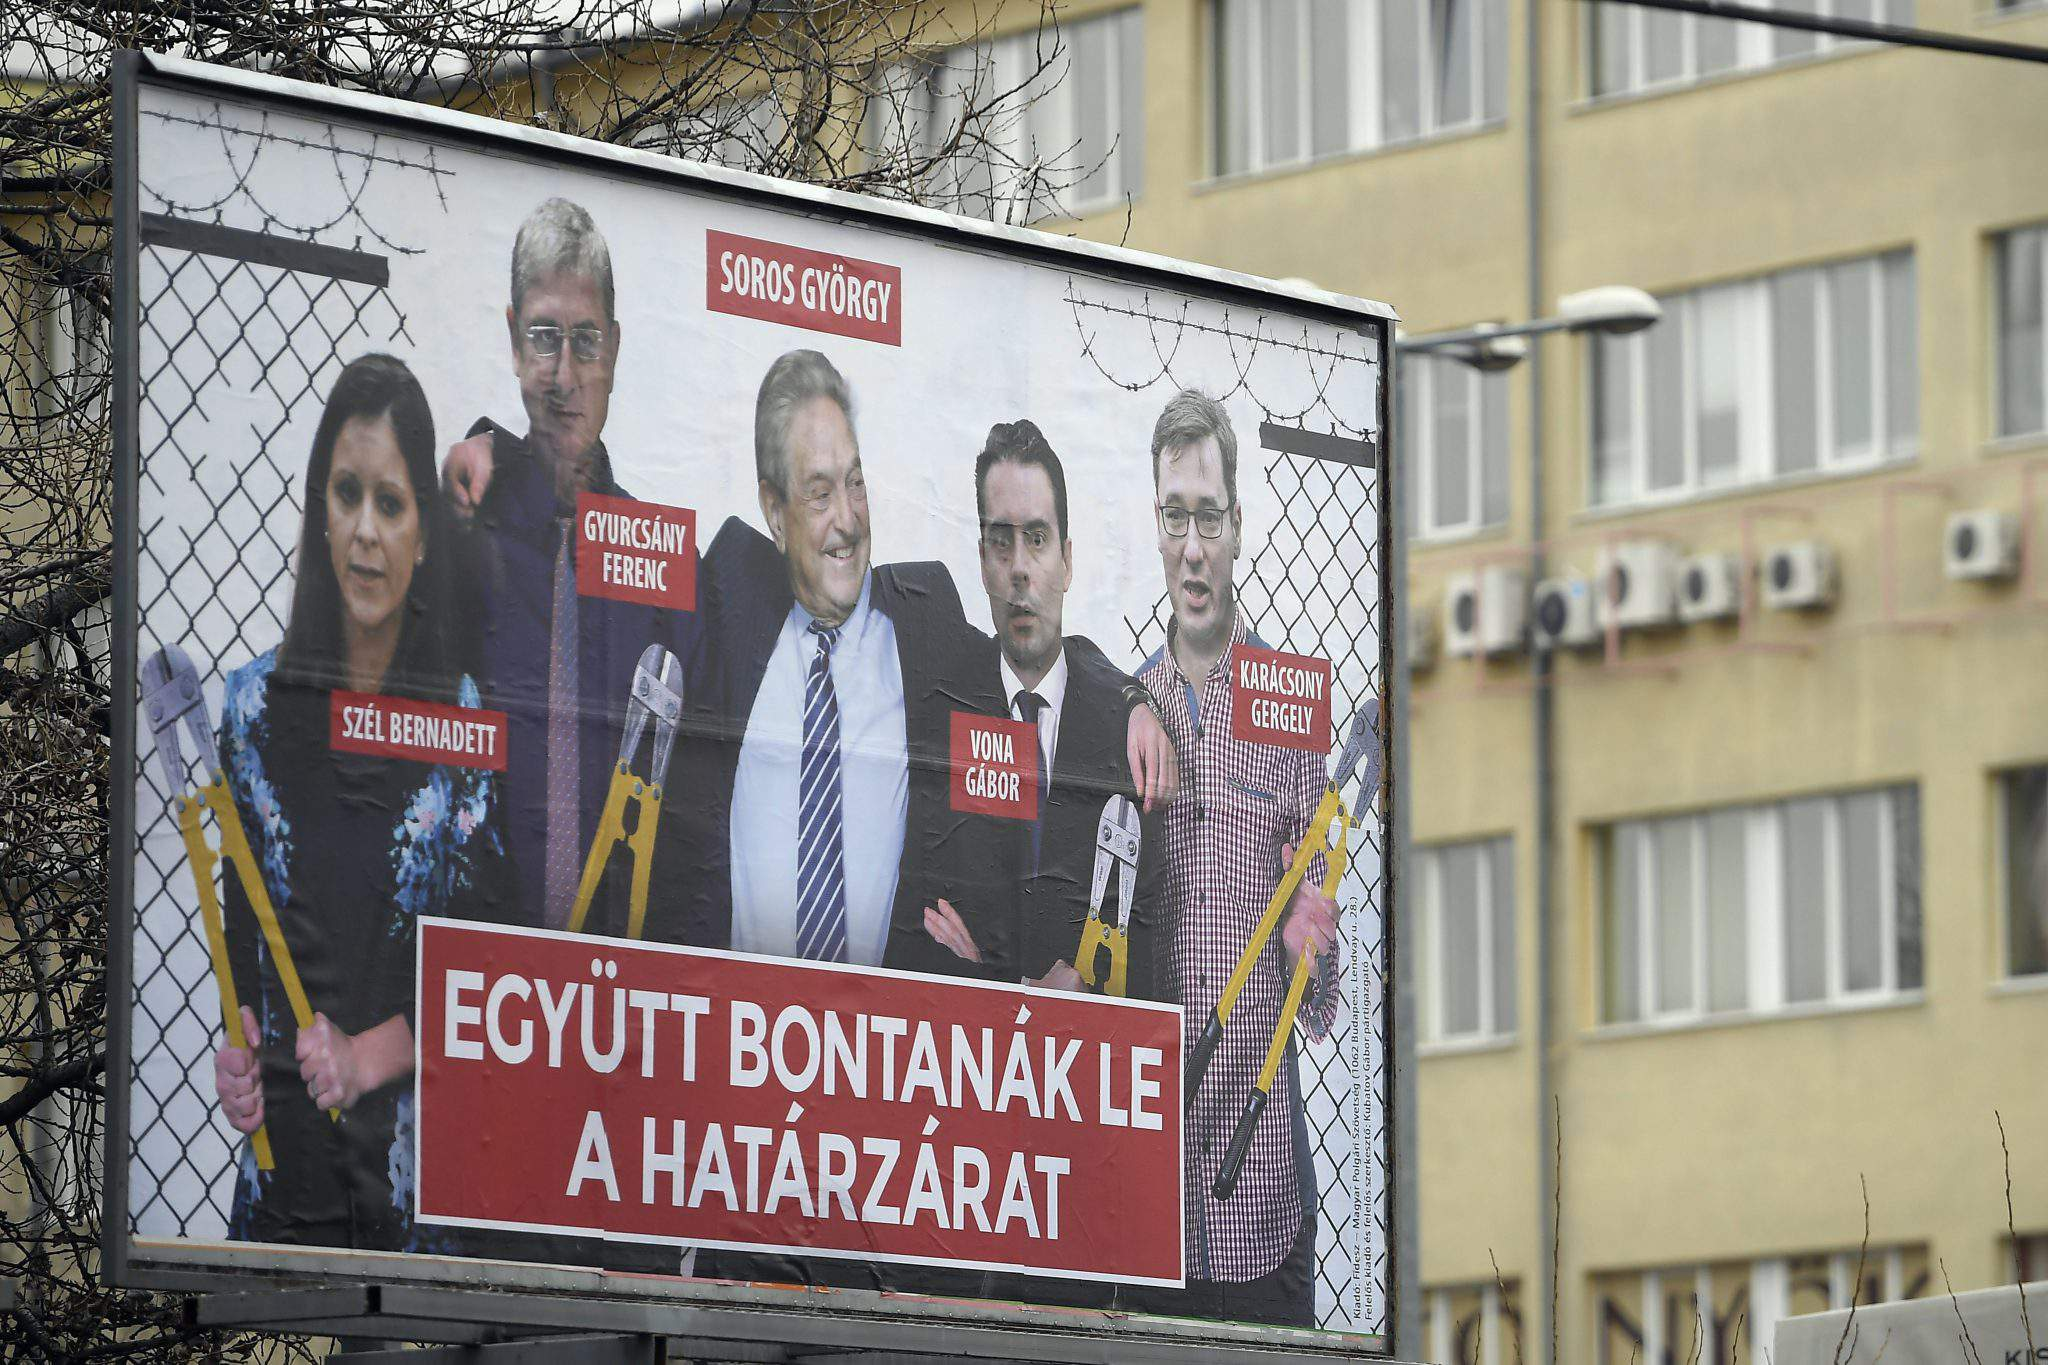 soros billborard hungary fidesz